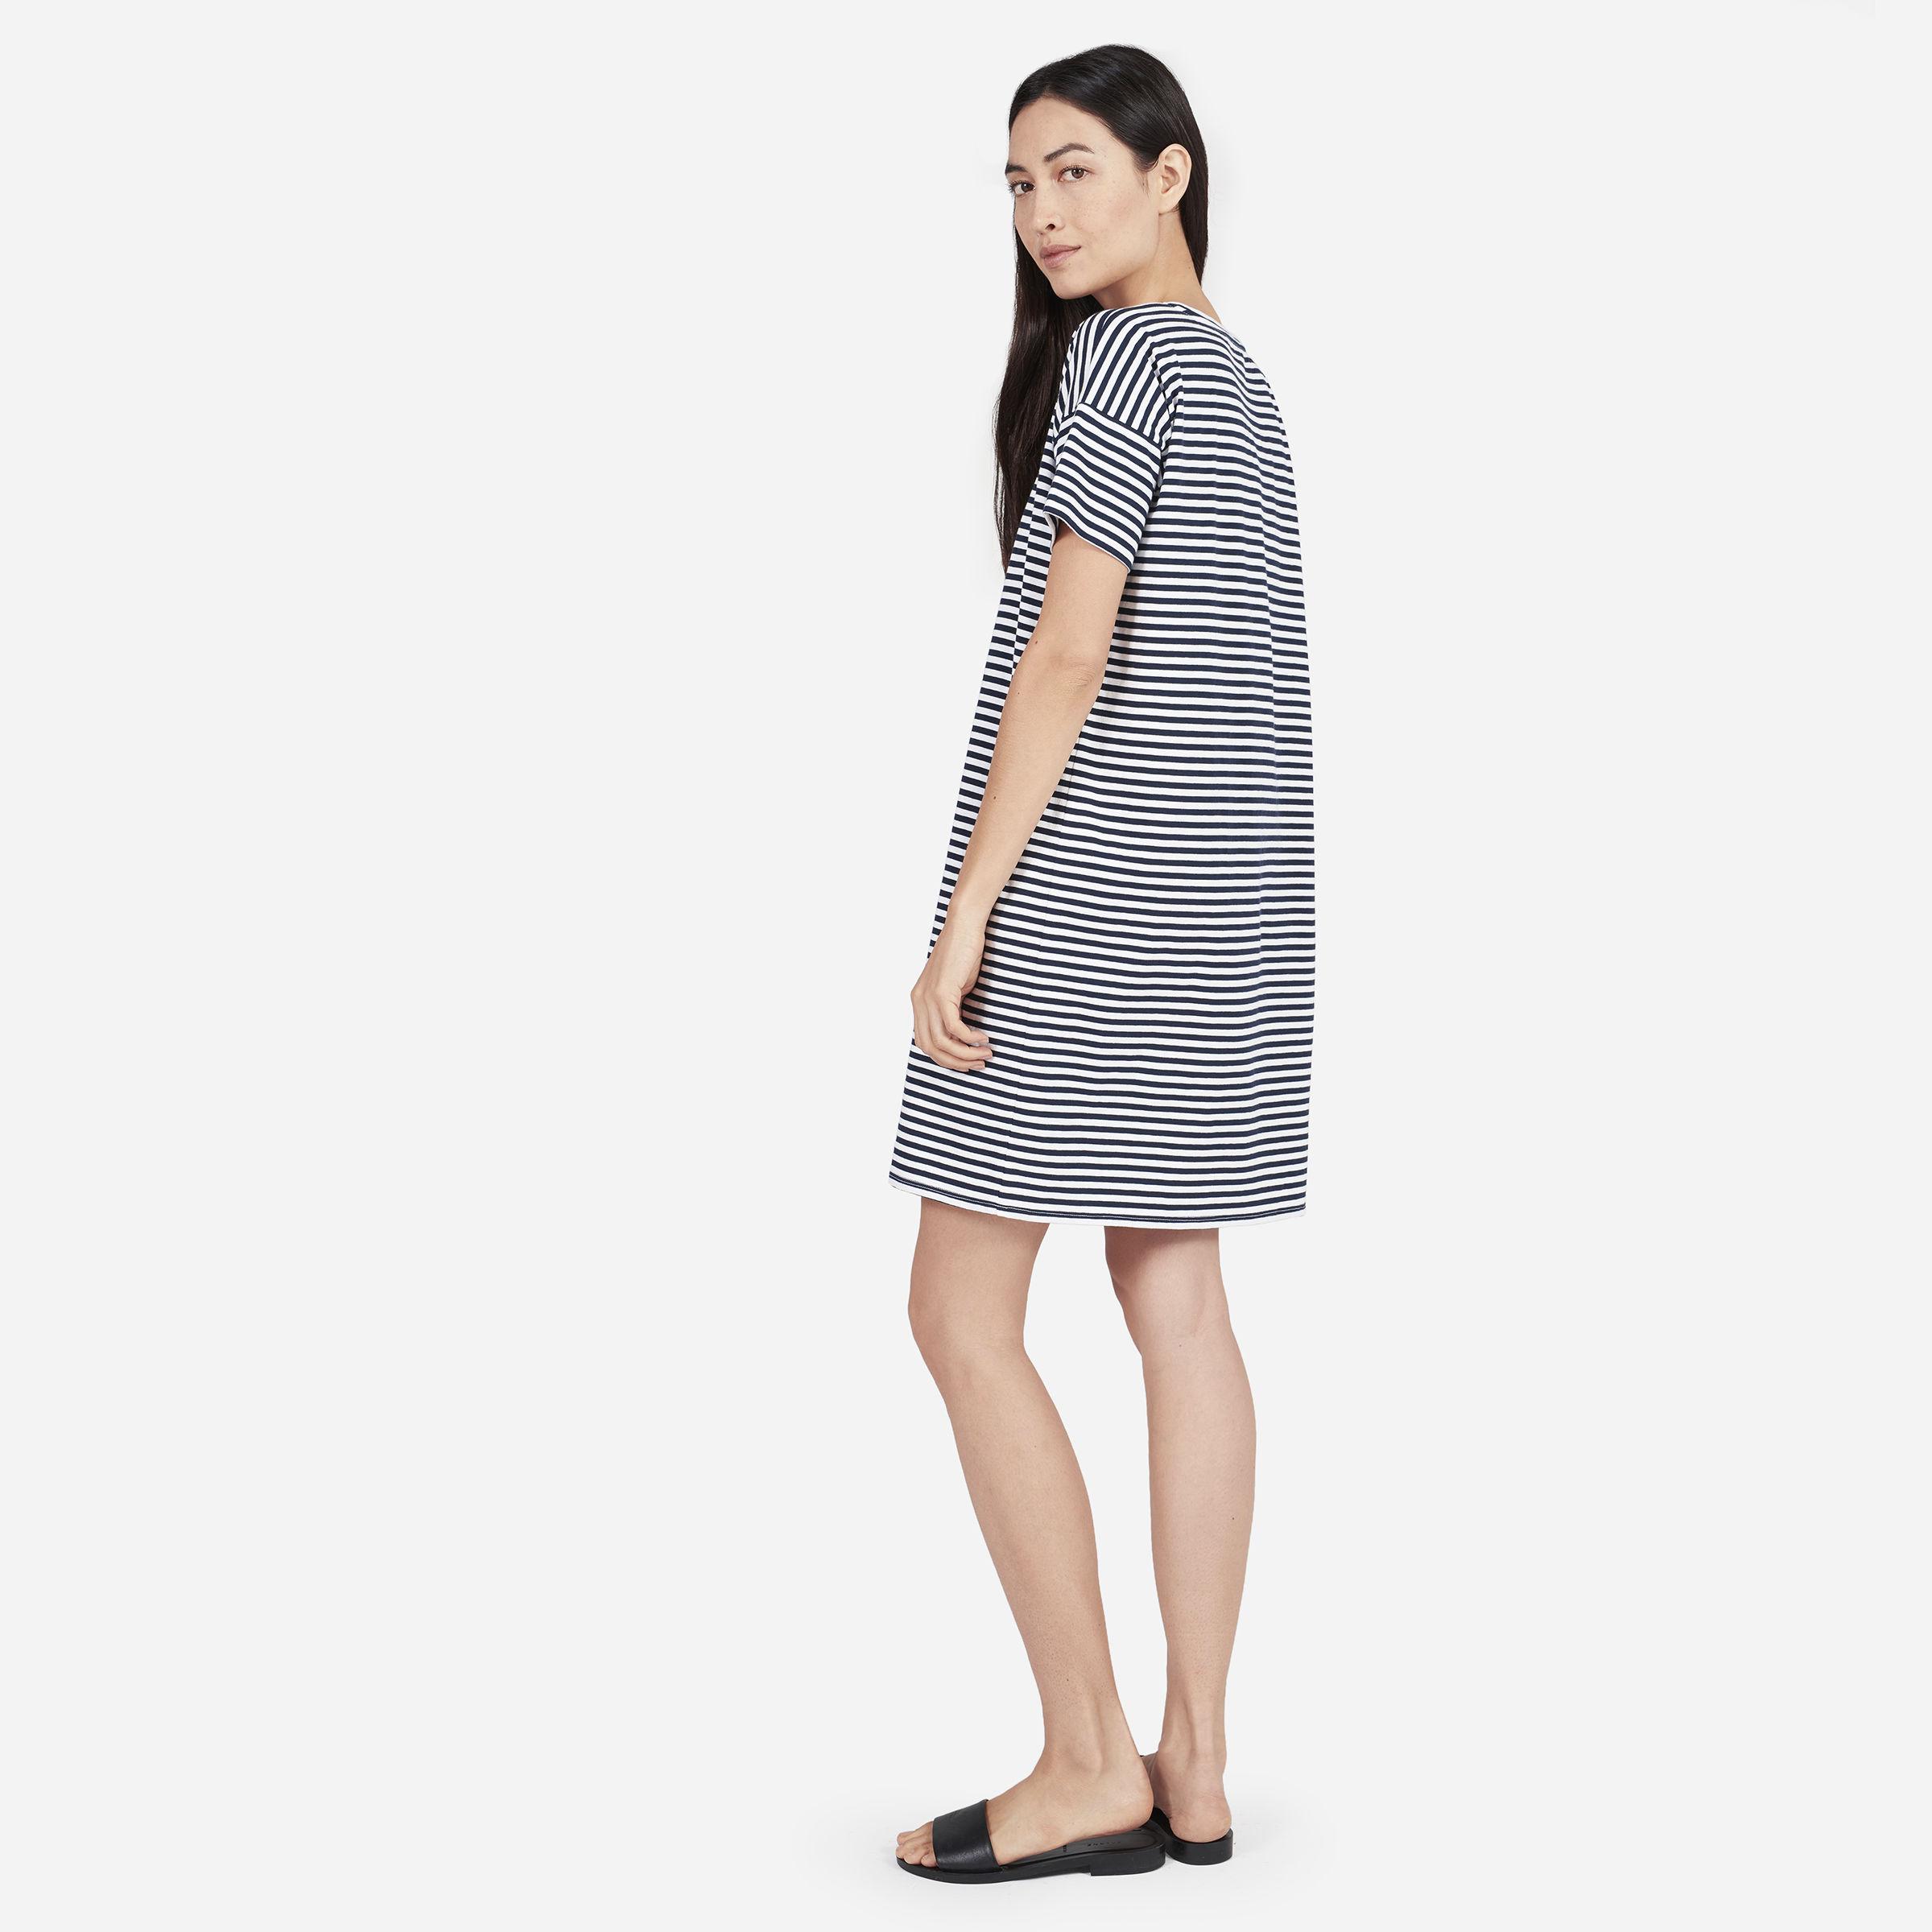 86c4f9cc91b9c The Cotton Striped Tee Dress